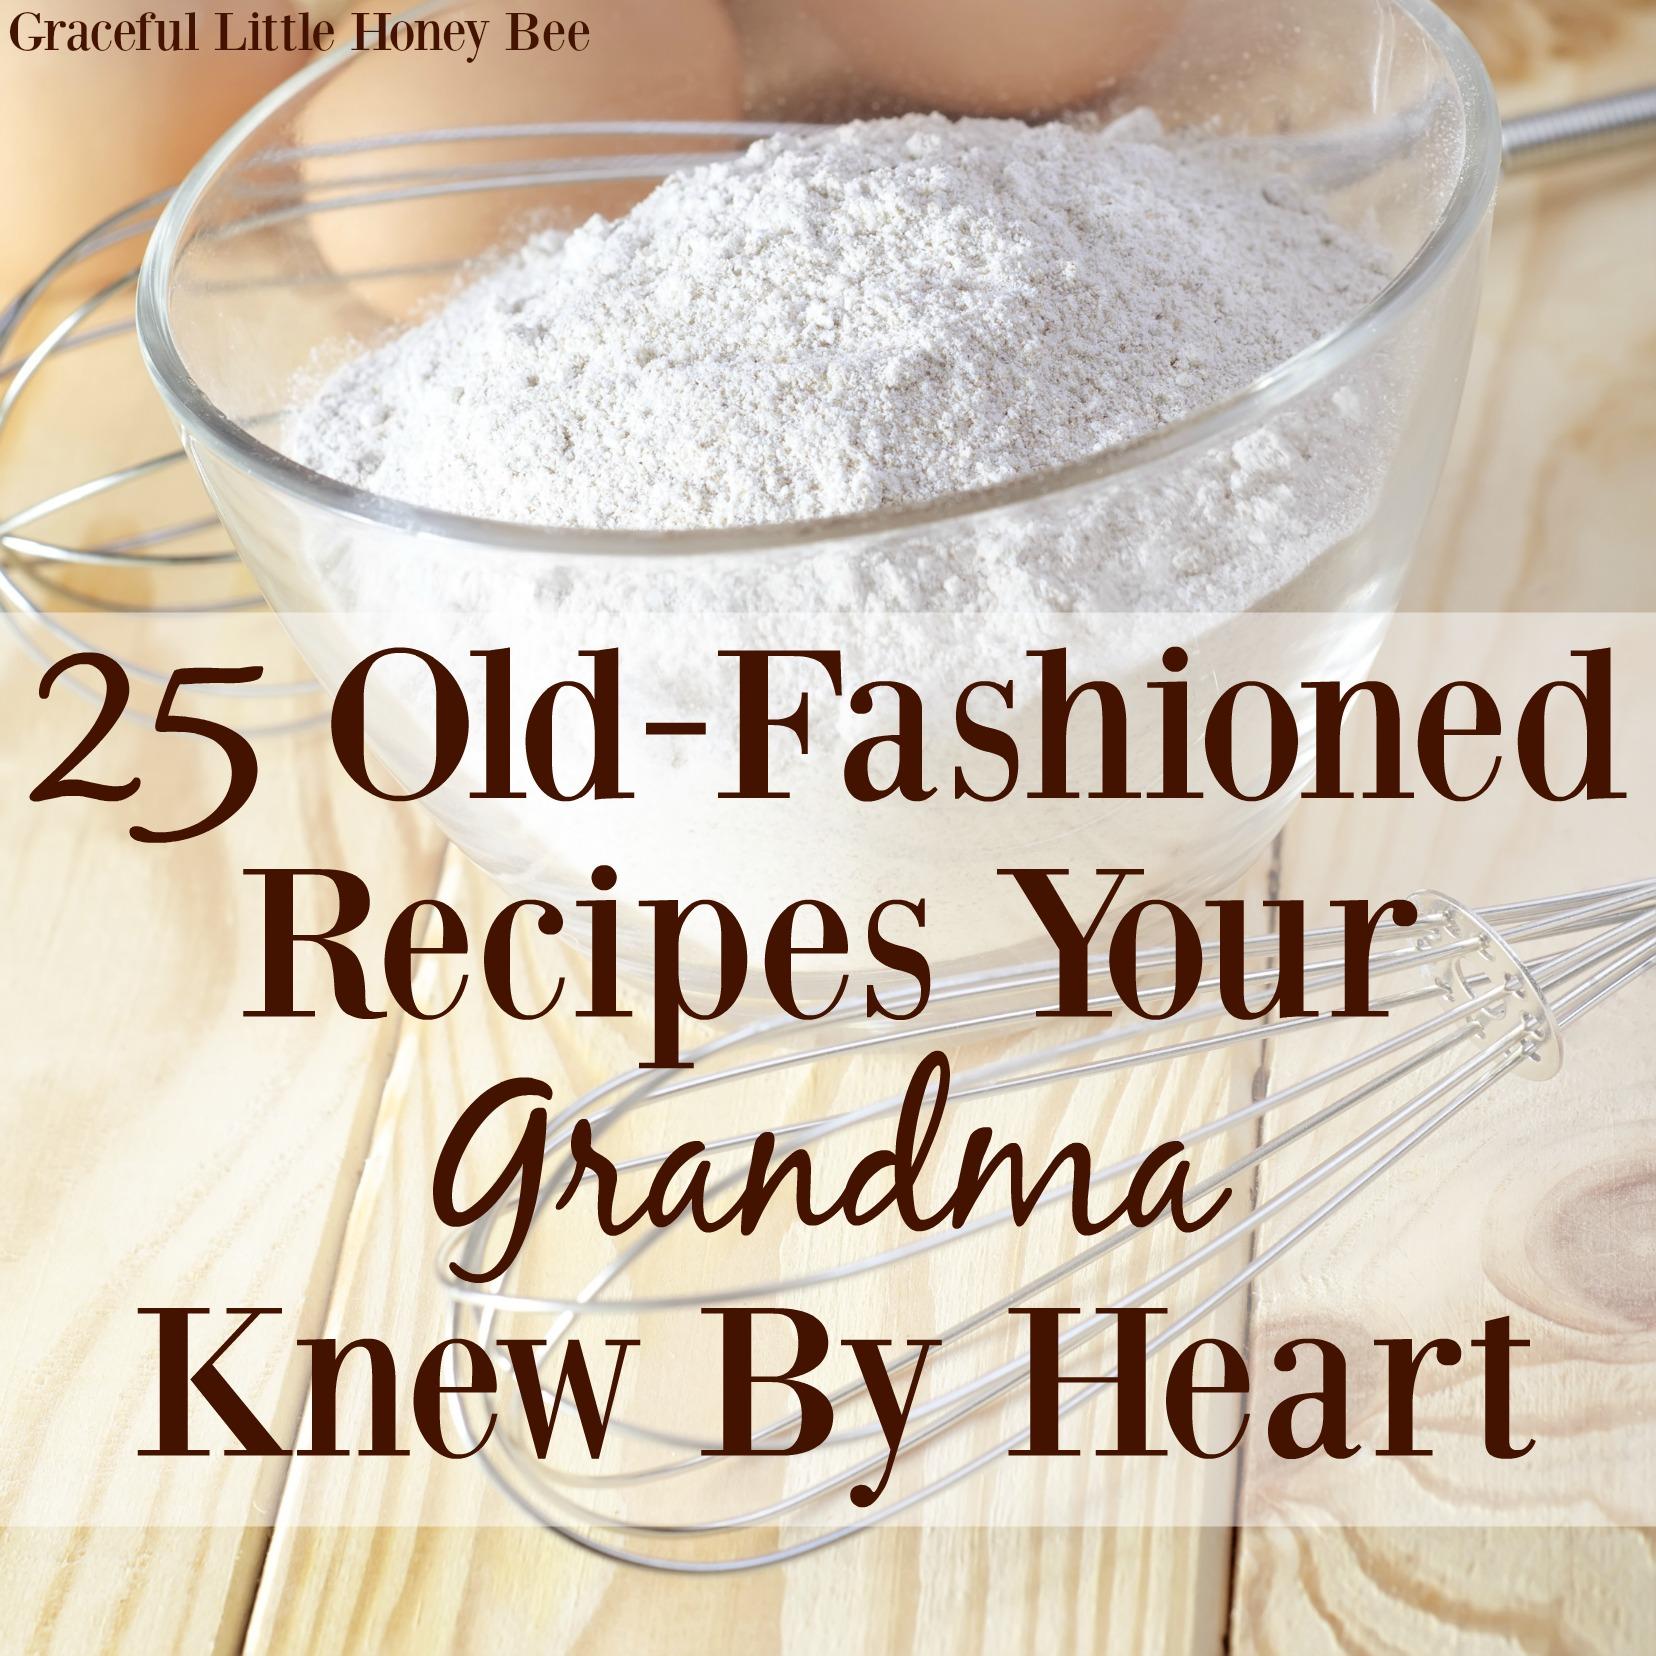 Graceful Little Honeybee  Old Fashioned Recipes